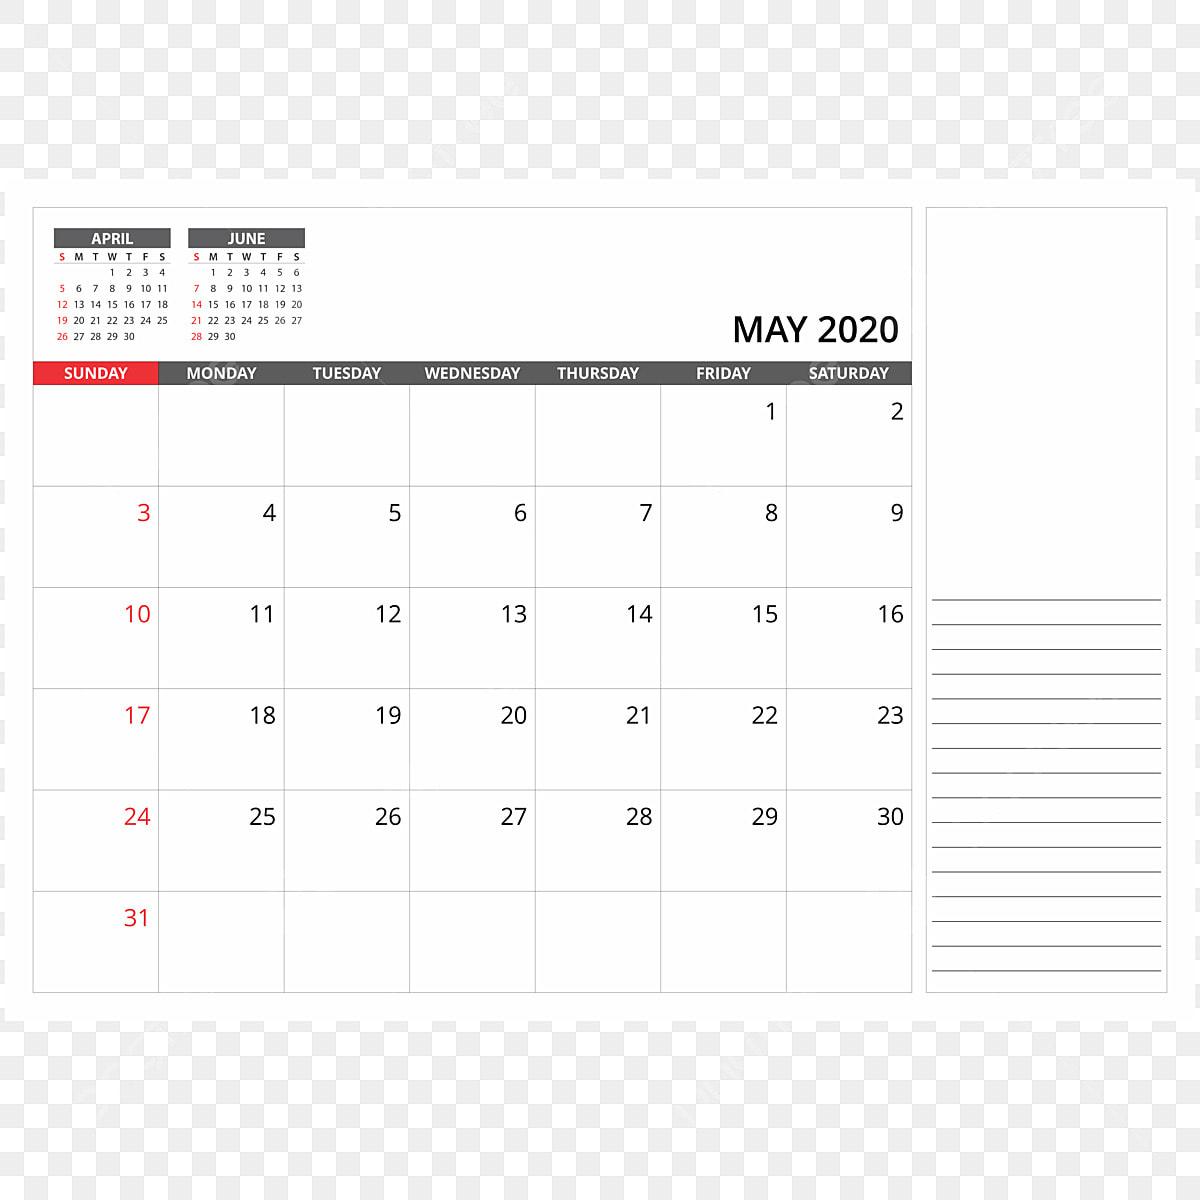 Calendrier Lunaire Mai 2020.Calendrier De Bureau Mensuel De Mai 2020 2020 Calendrier